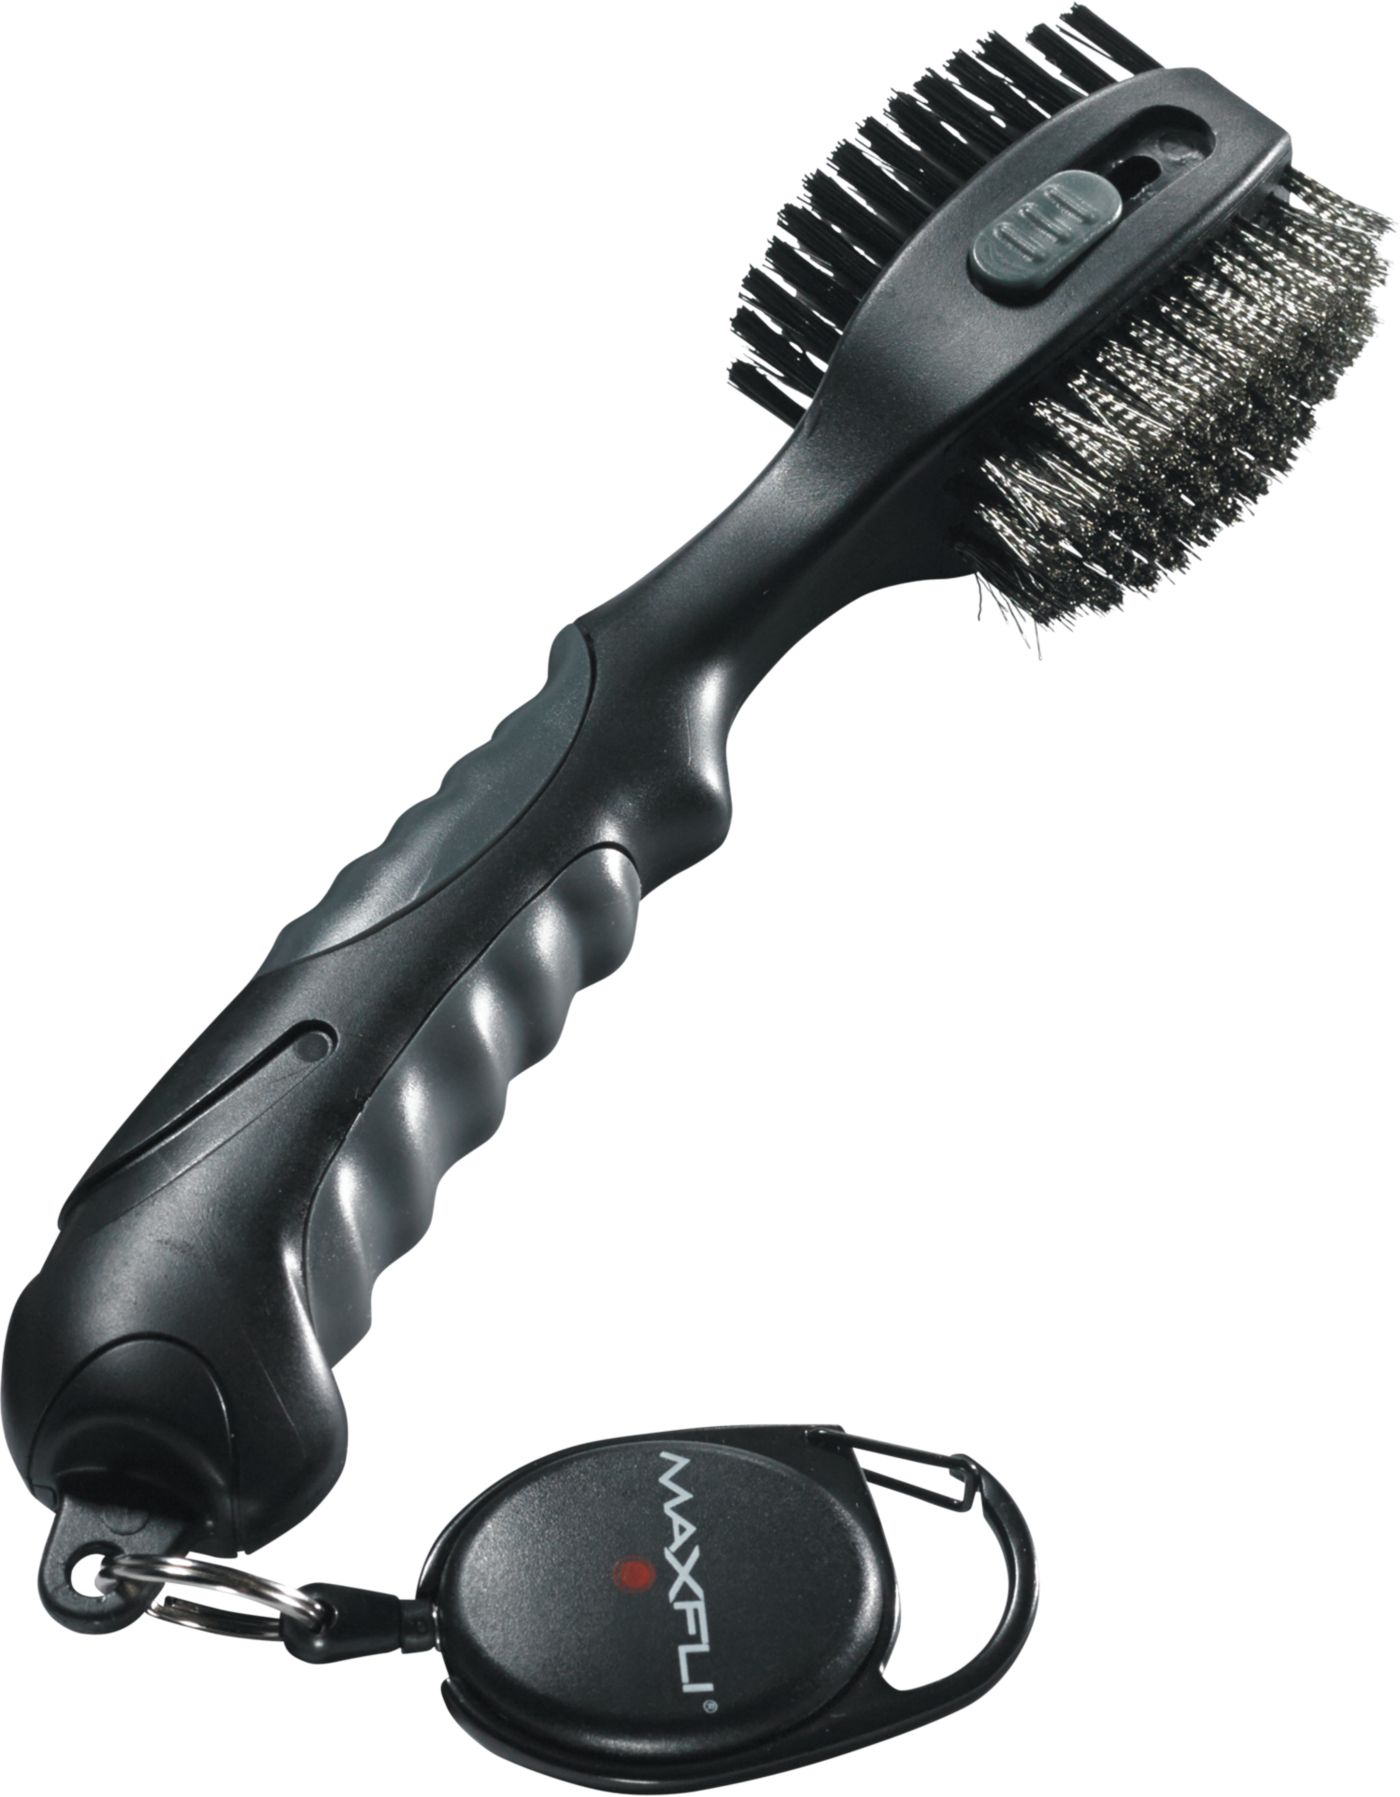 Maxfli Groover Brush